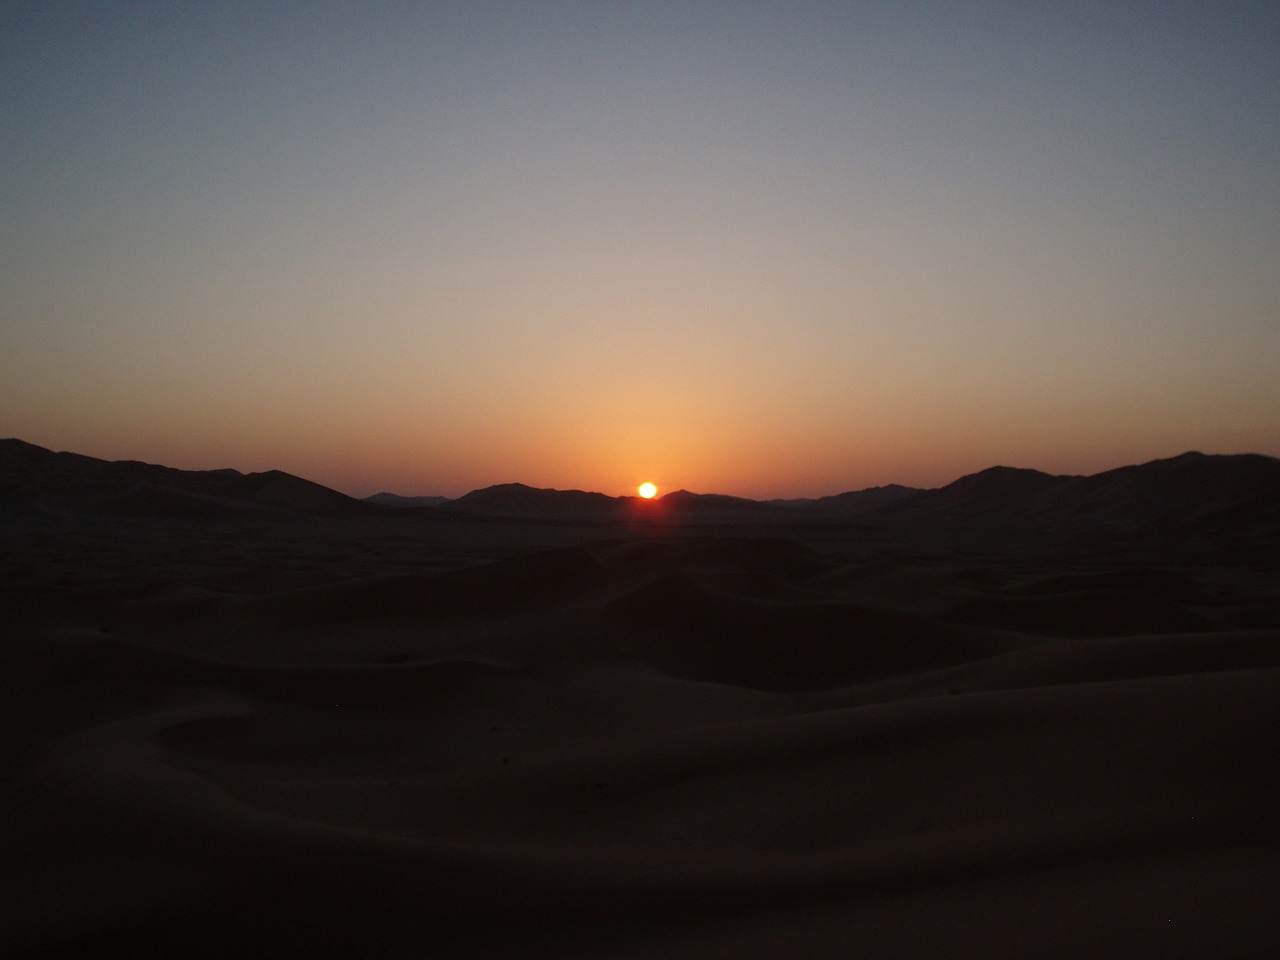 curiosity sunrise sunset times - HD1200×900